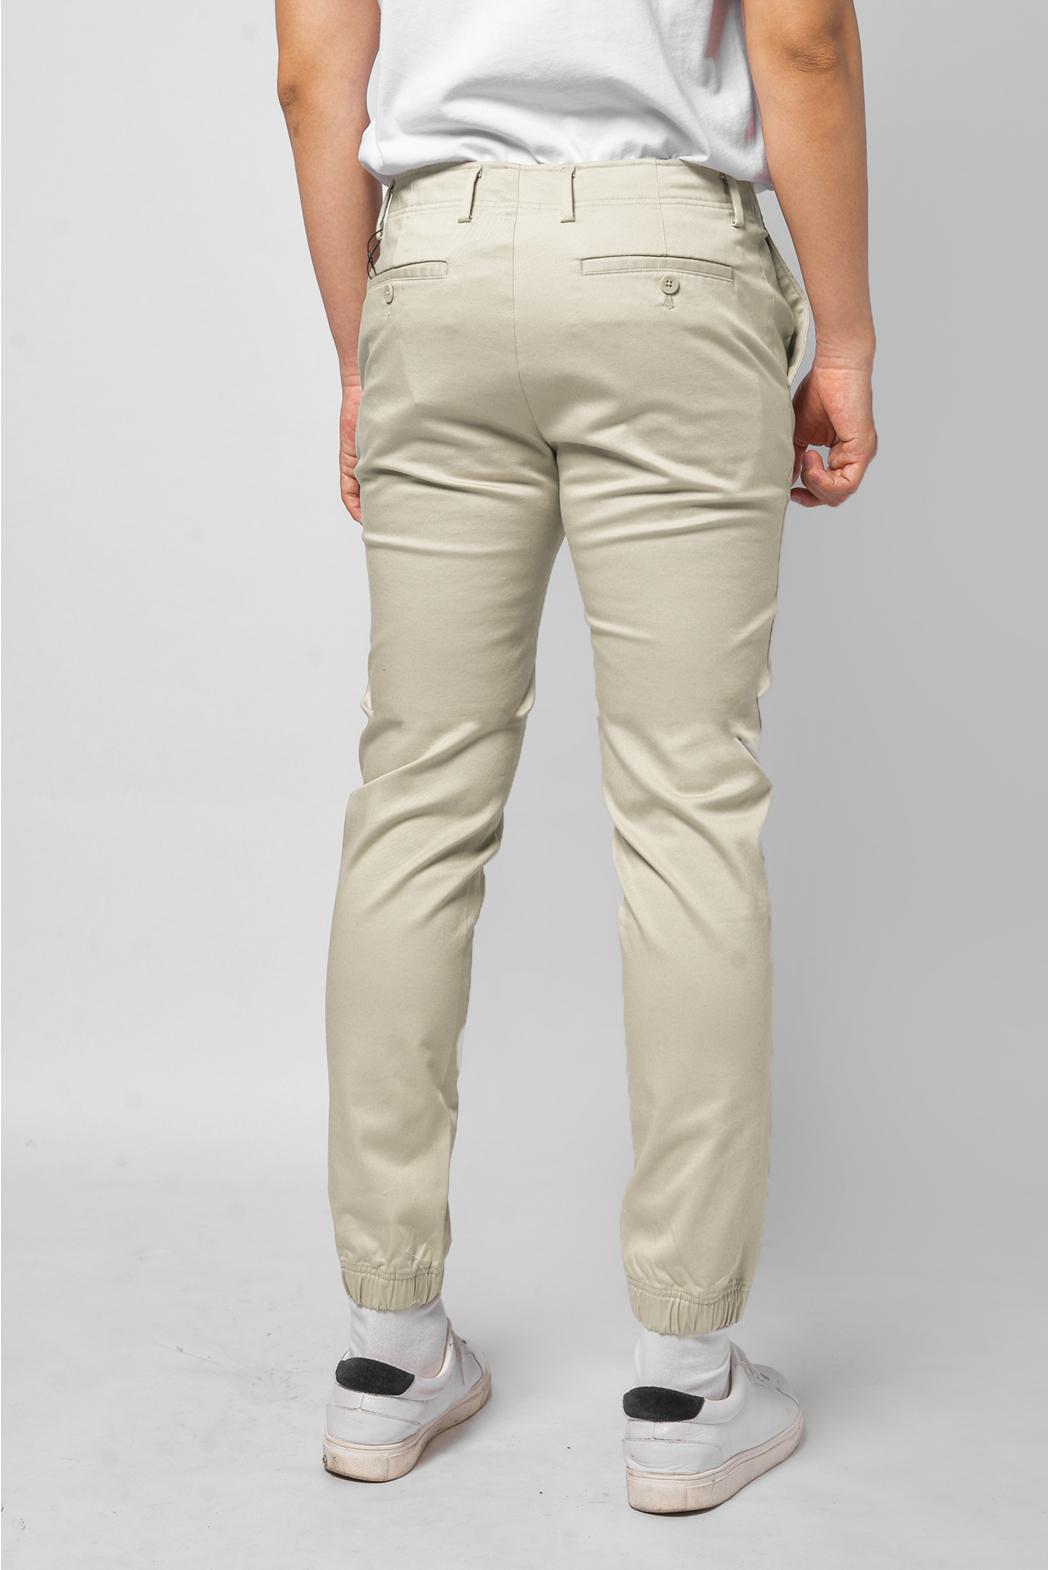 Quần kaki. Cotton. SLIM CROP form - 10F20PCA005